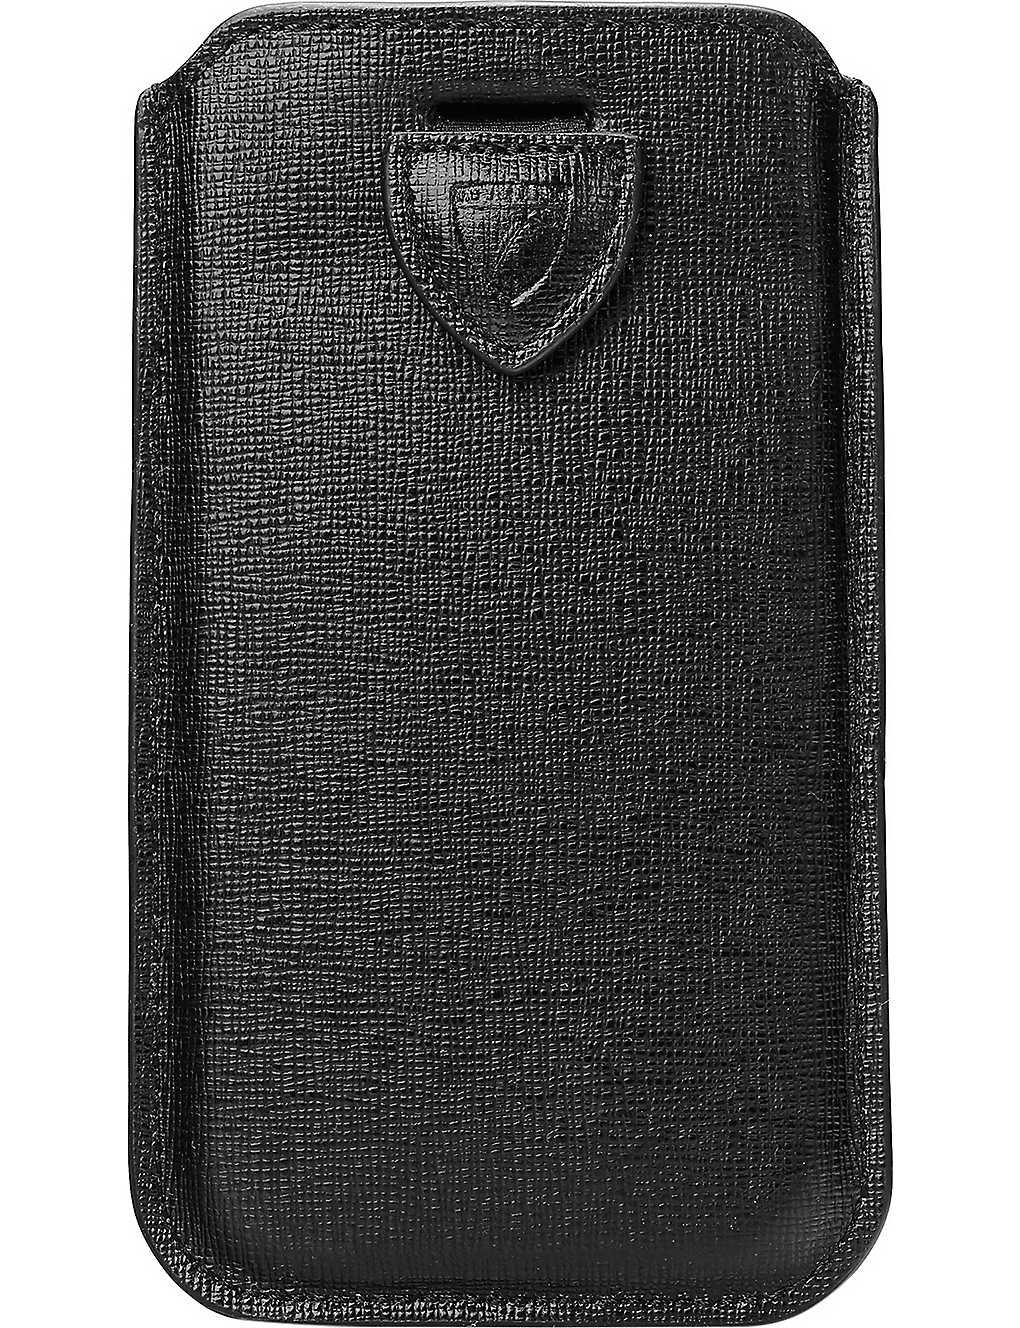 online retailer 96446 2f002 ASPINAL OF LONDON - Slim-fit leather iPhone 6 Plus case   Selfridges.com